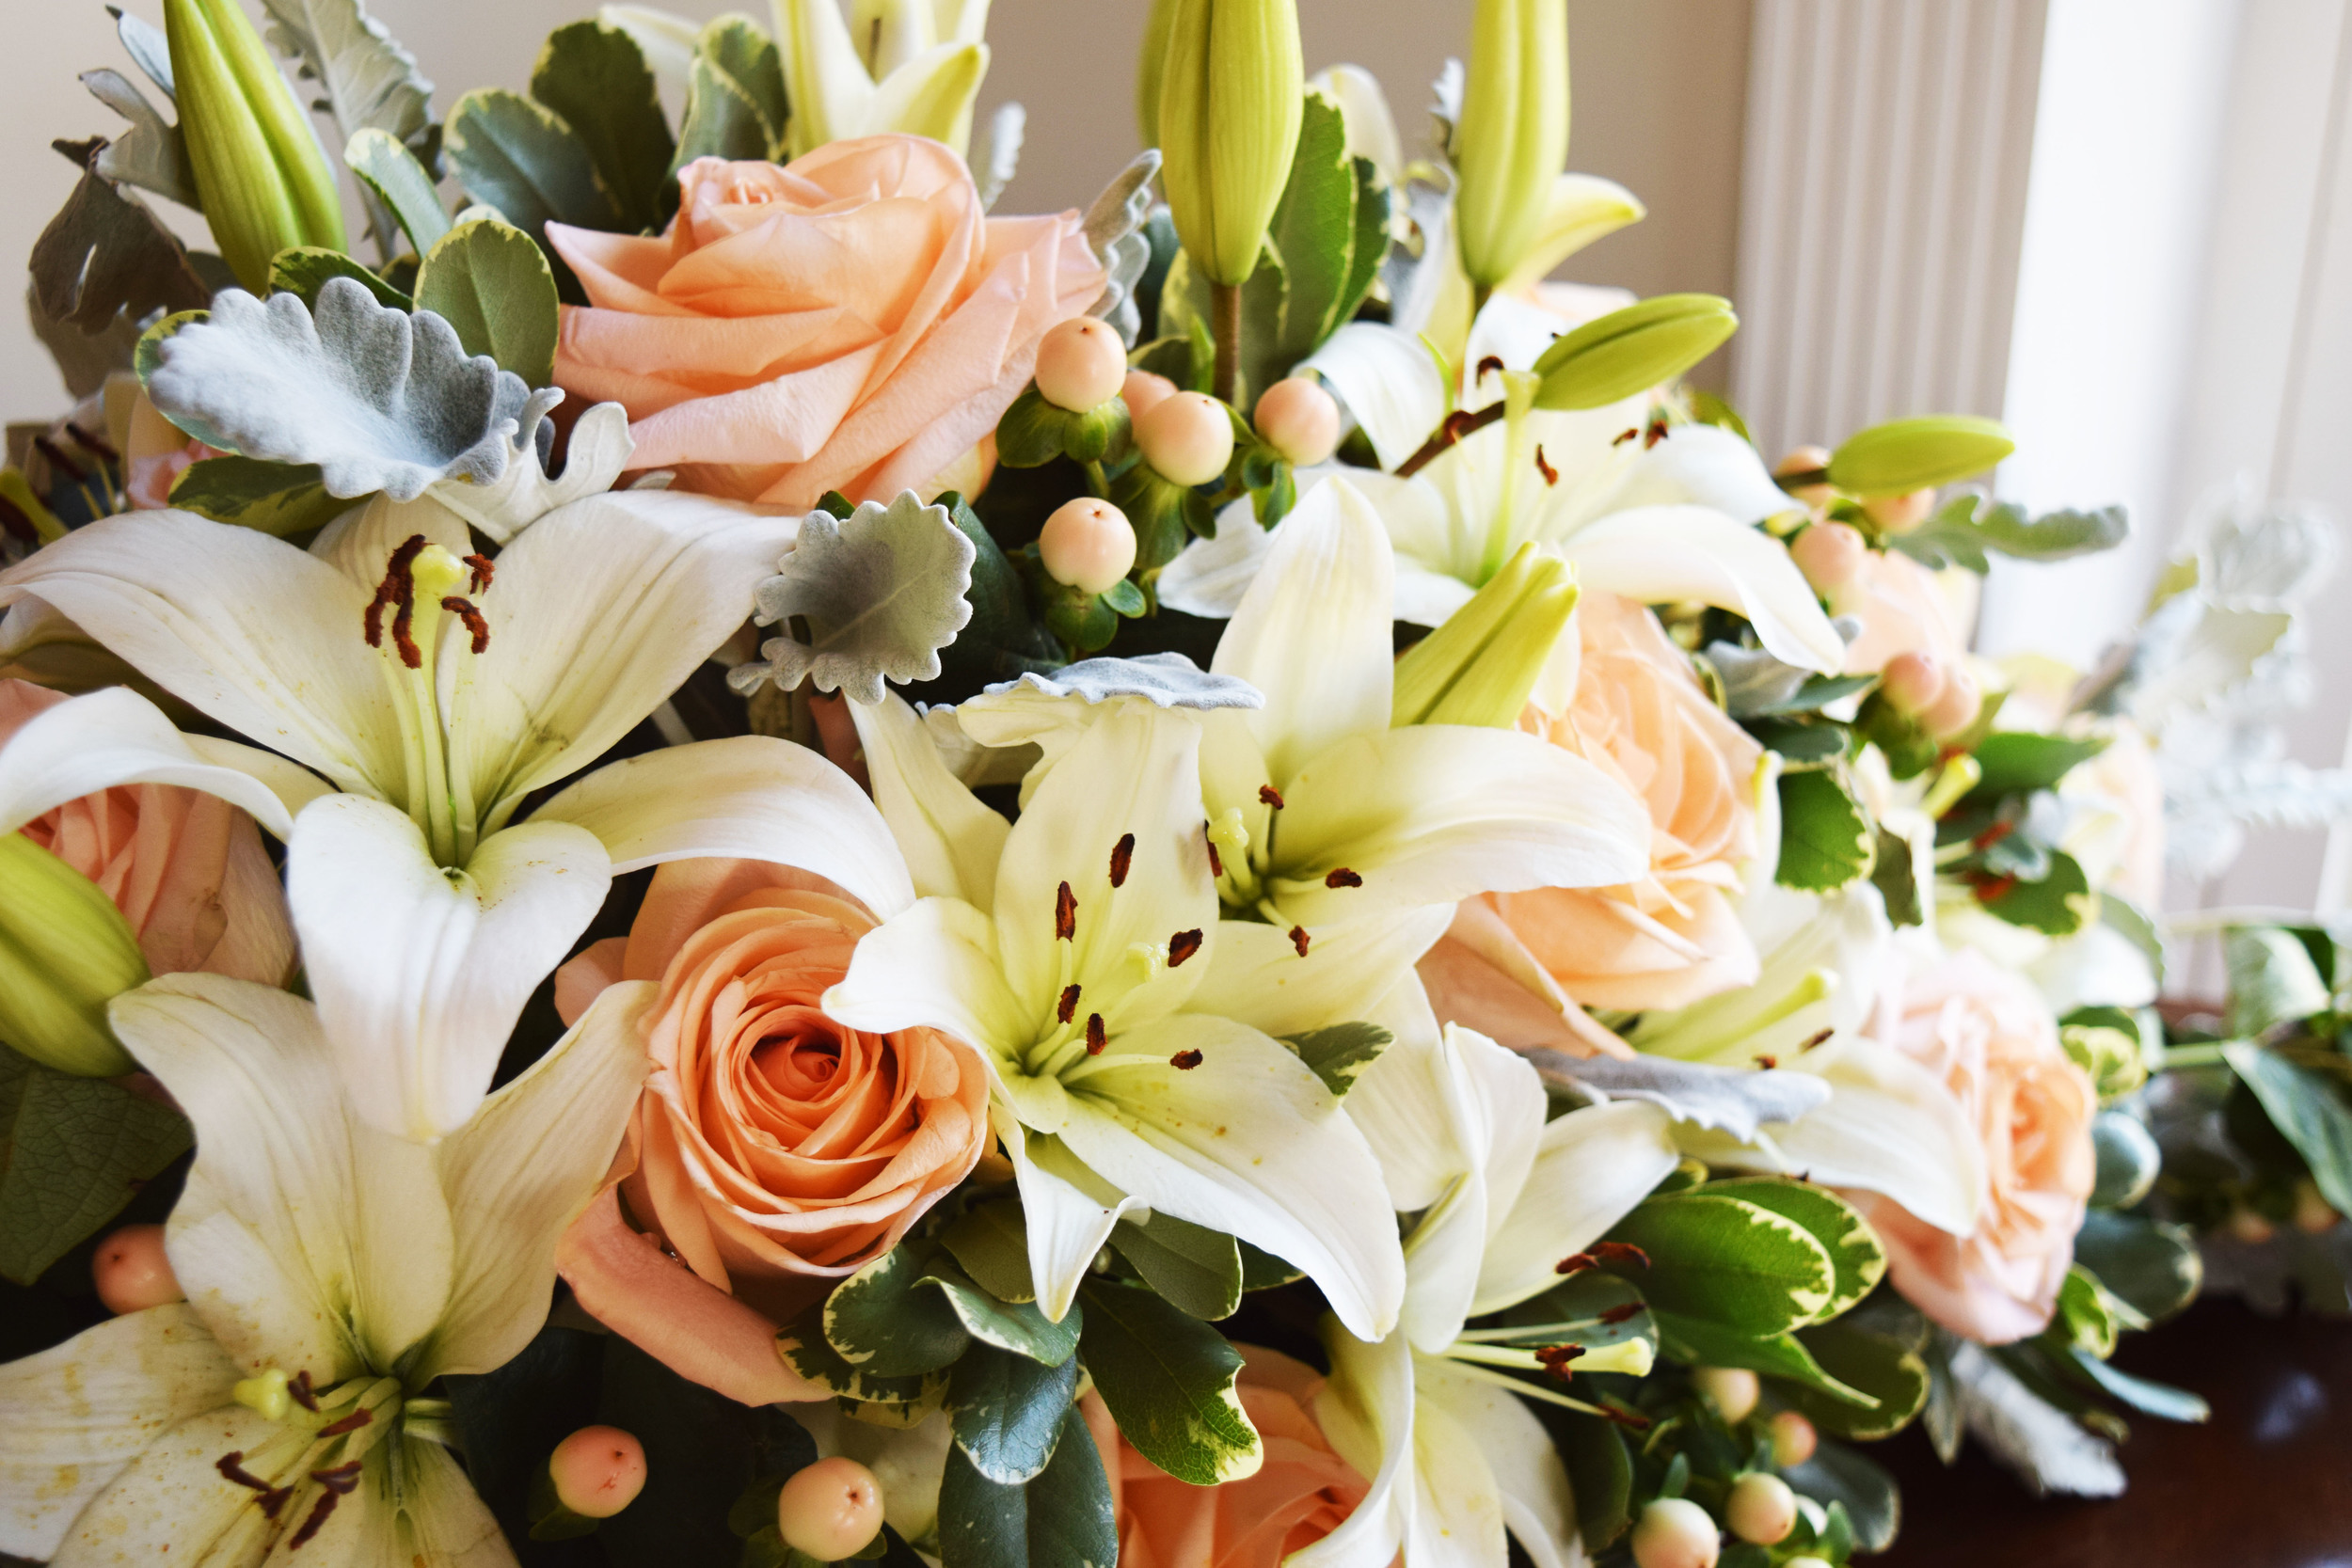 Yes! We make floral arrangements too! Our lead designer and florist creates beautiful bouquets, boutonnieres, floral centerpieces, ceremony floral arrangements, flower crowns, and more!